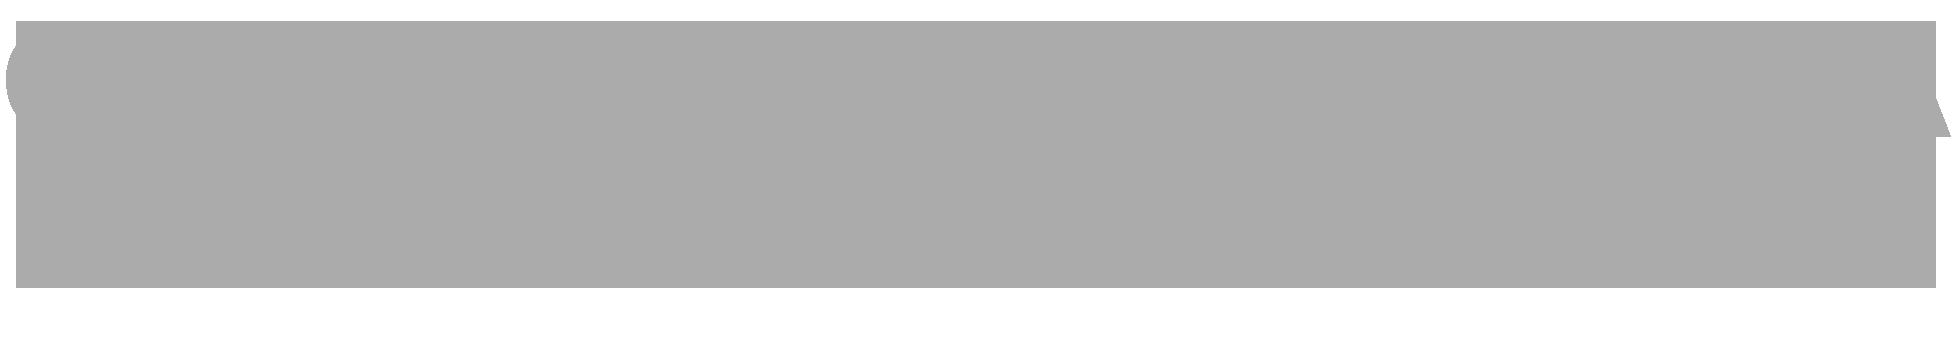 ORTOPEDIA SANITARIA PUNTO SALUTE - Logo